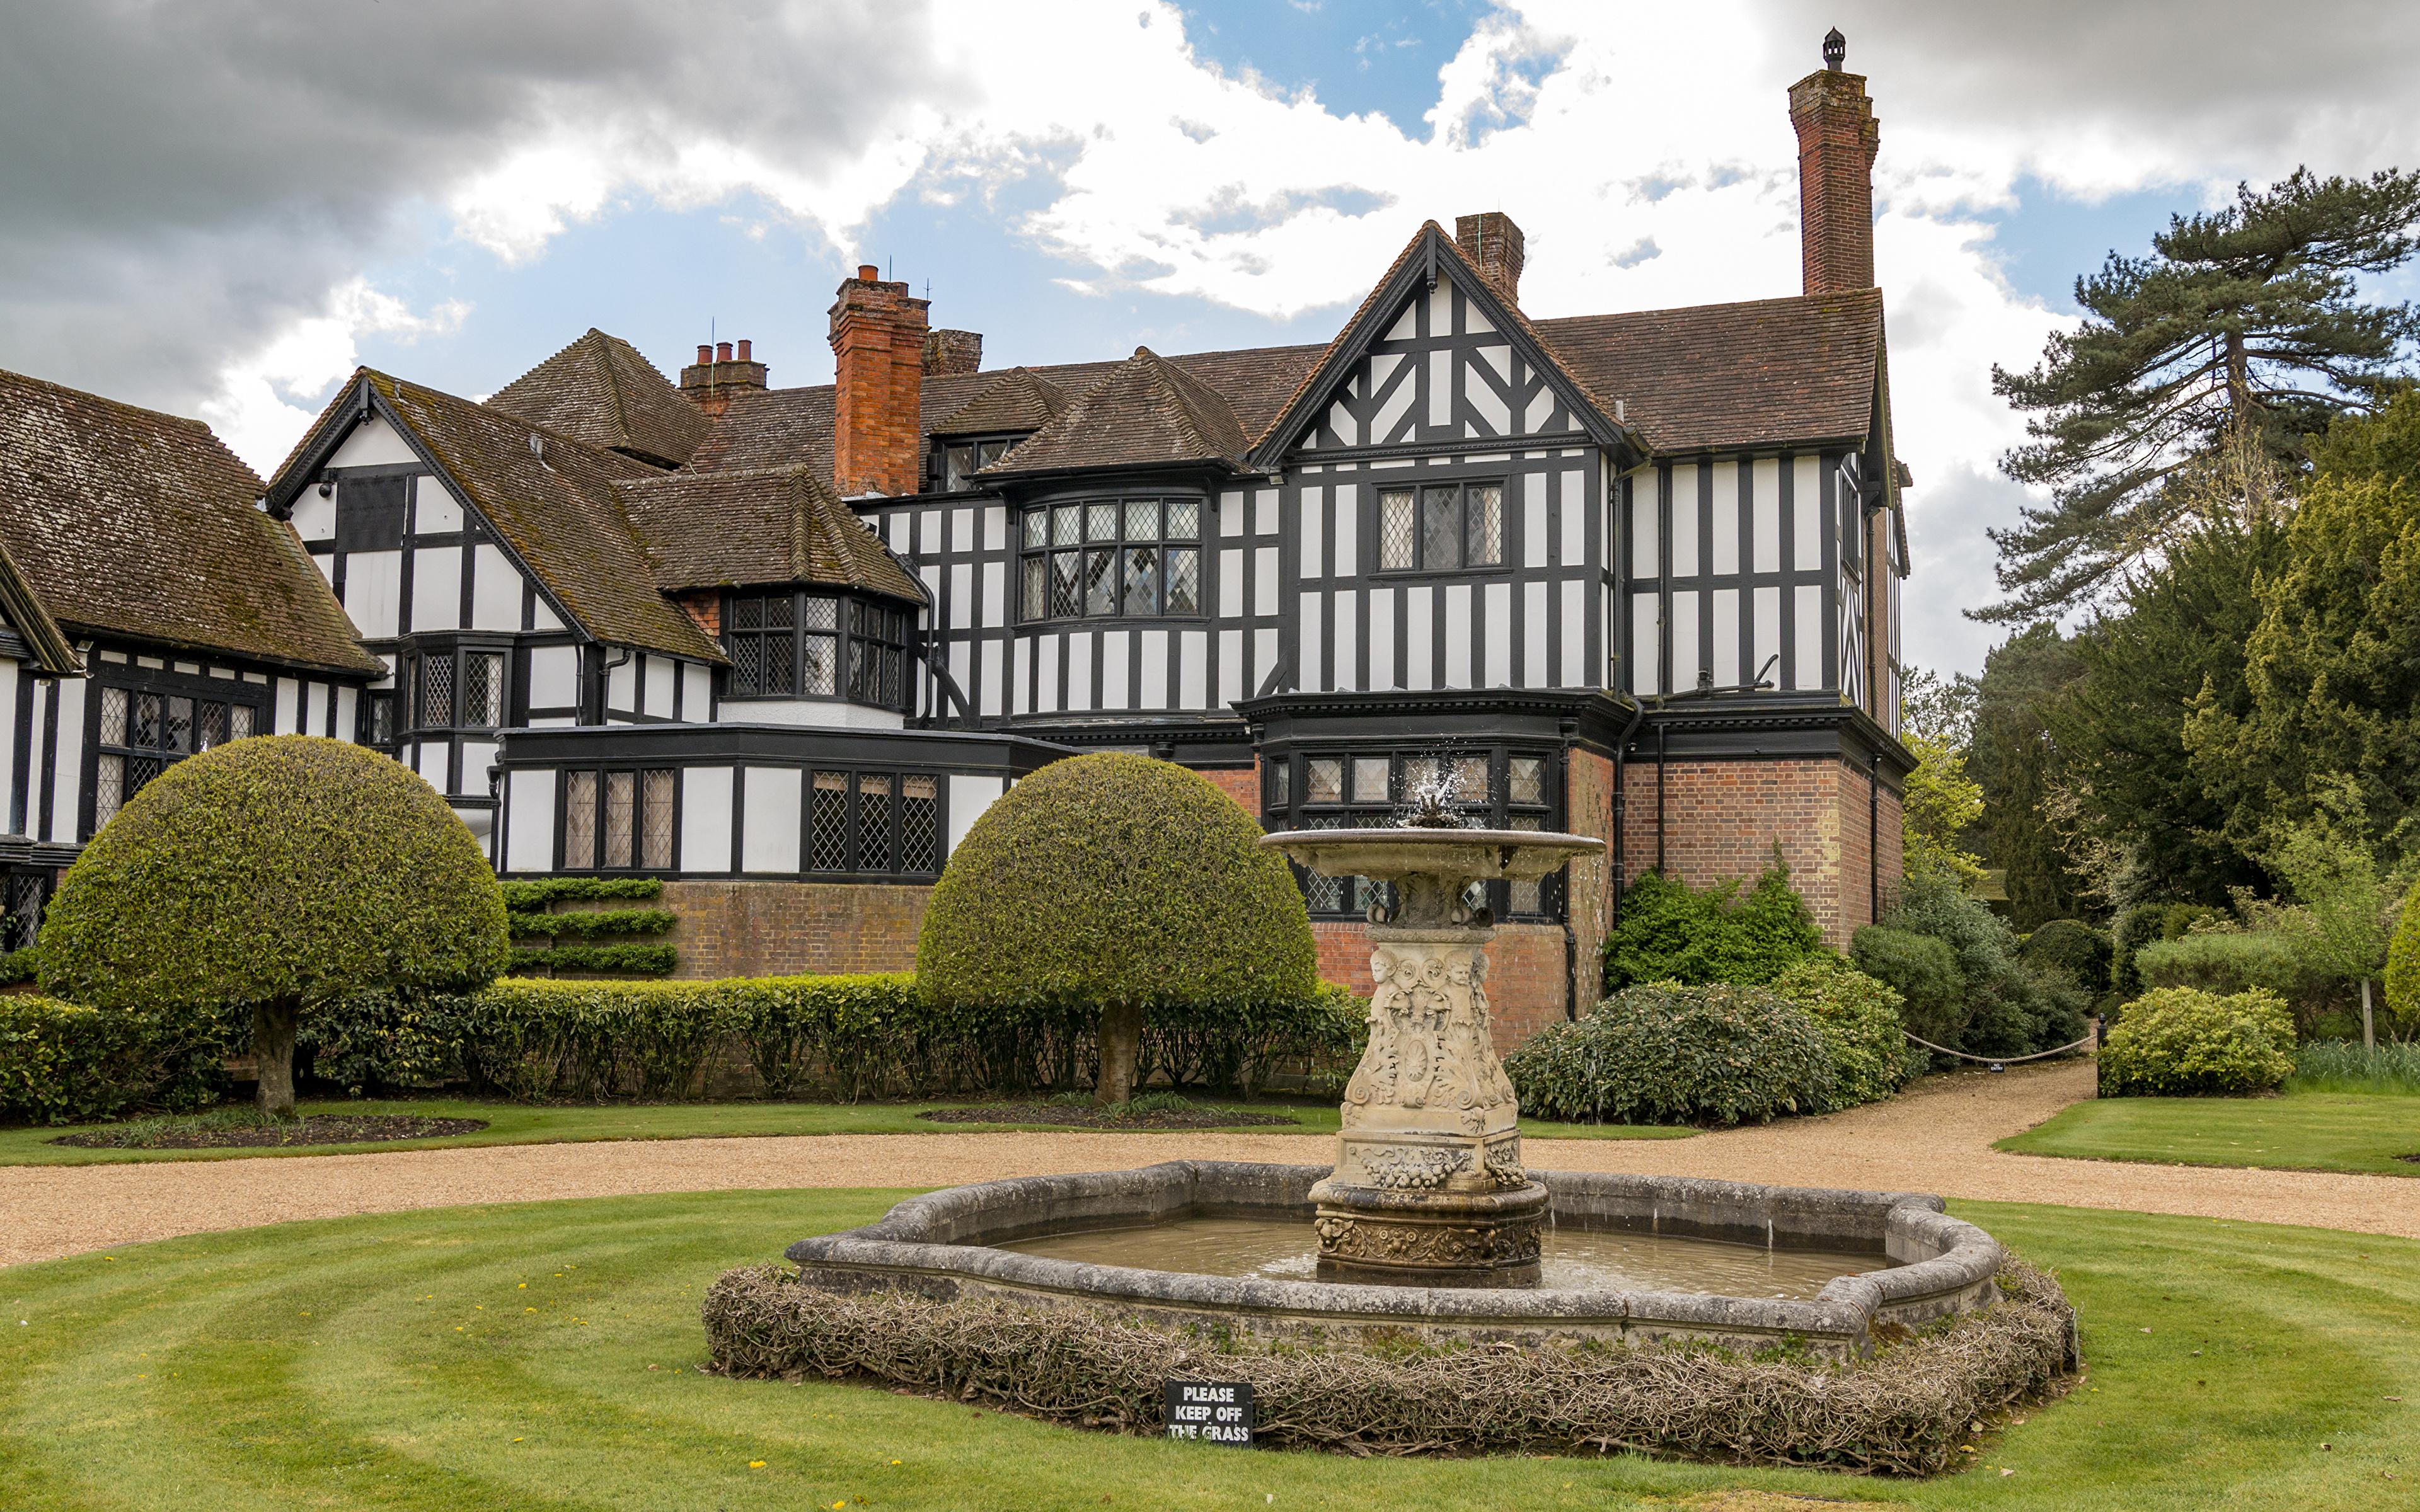 3840x2400、イギリス、住宅、噴水、Ascott House、邸宅、デザイン、芝、低木、建物、都市、